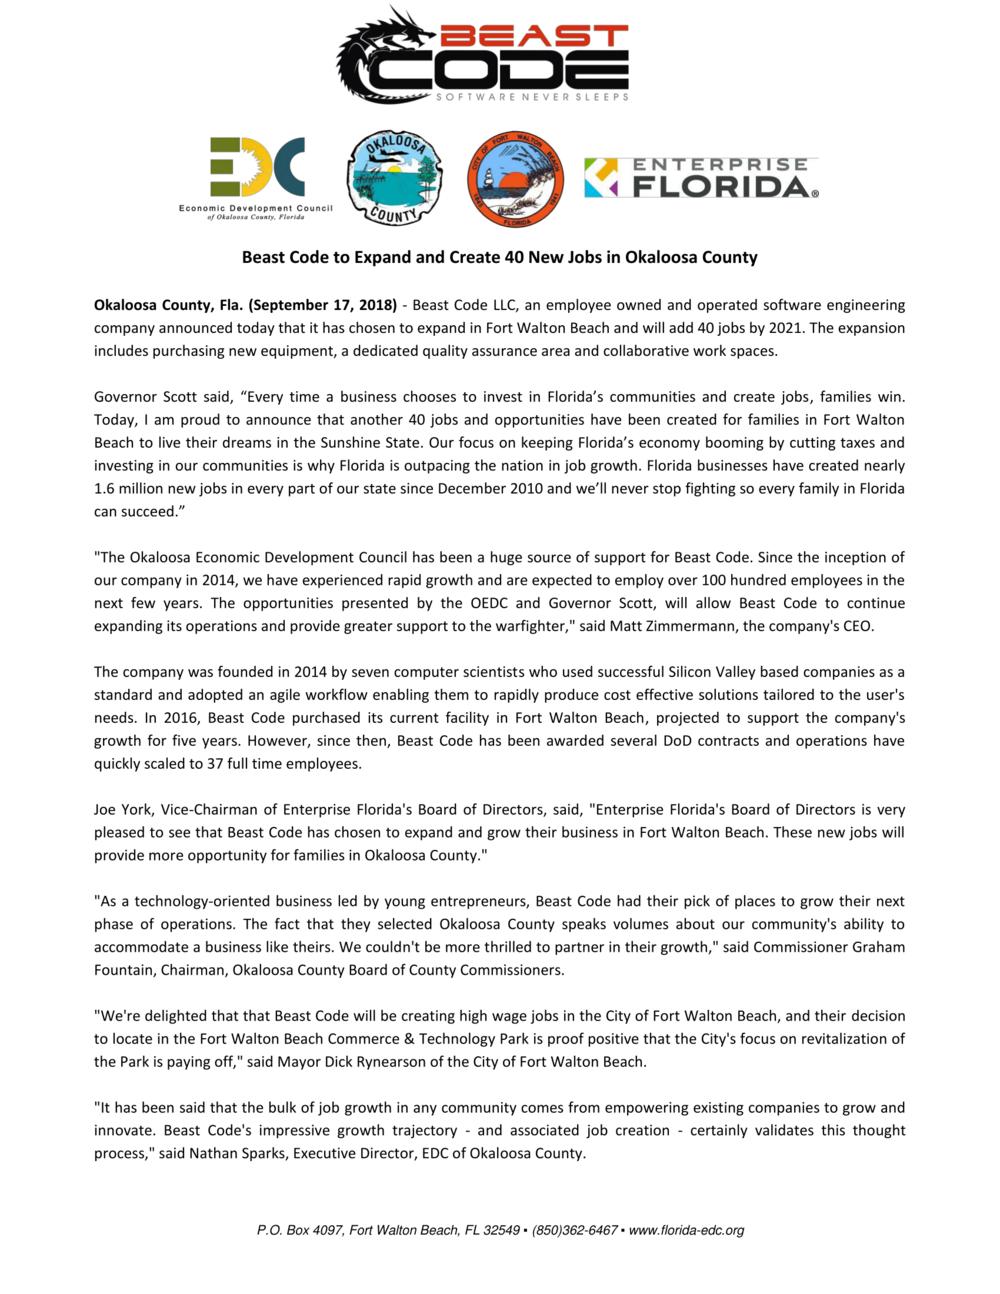 Beast Code Press Release - 9.17.18-1.png